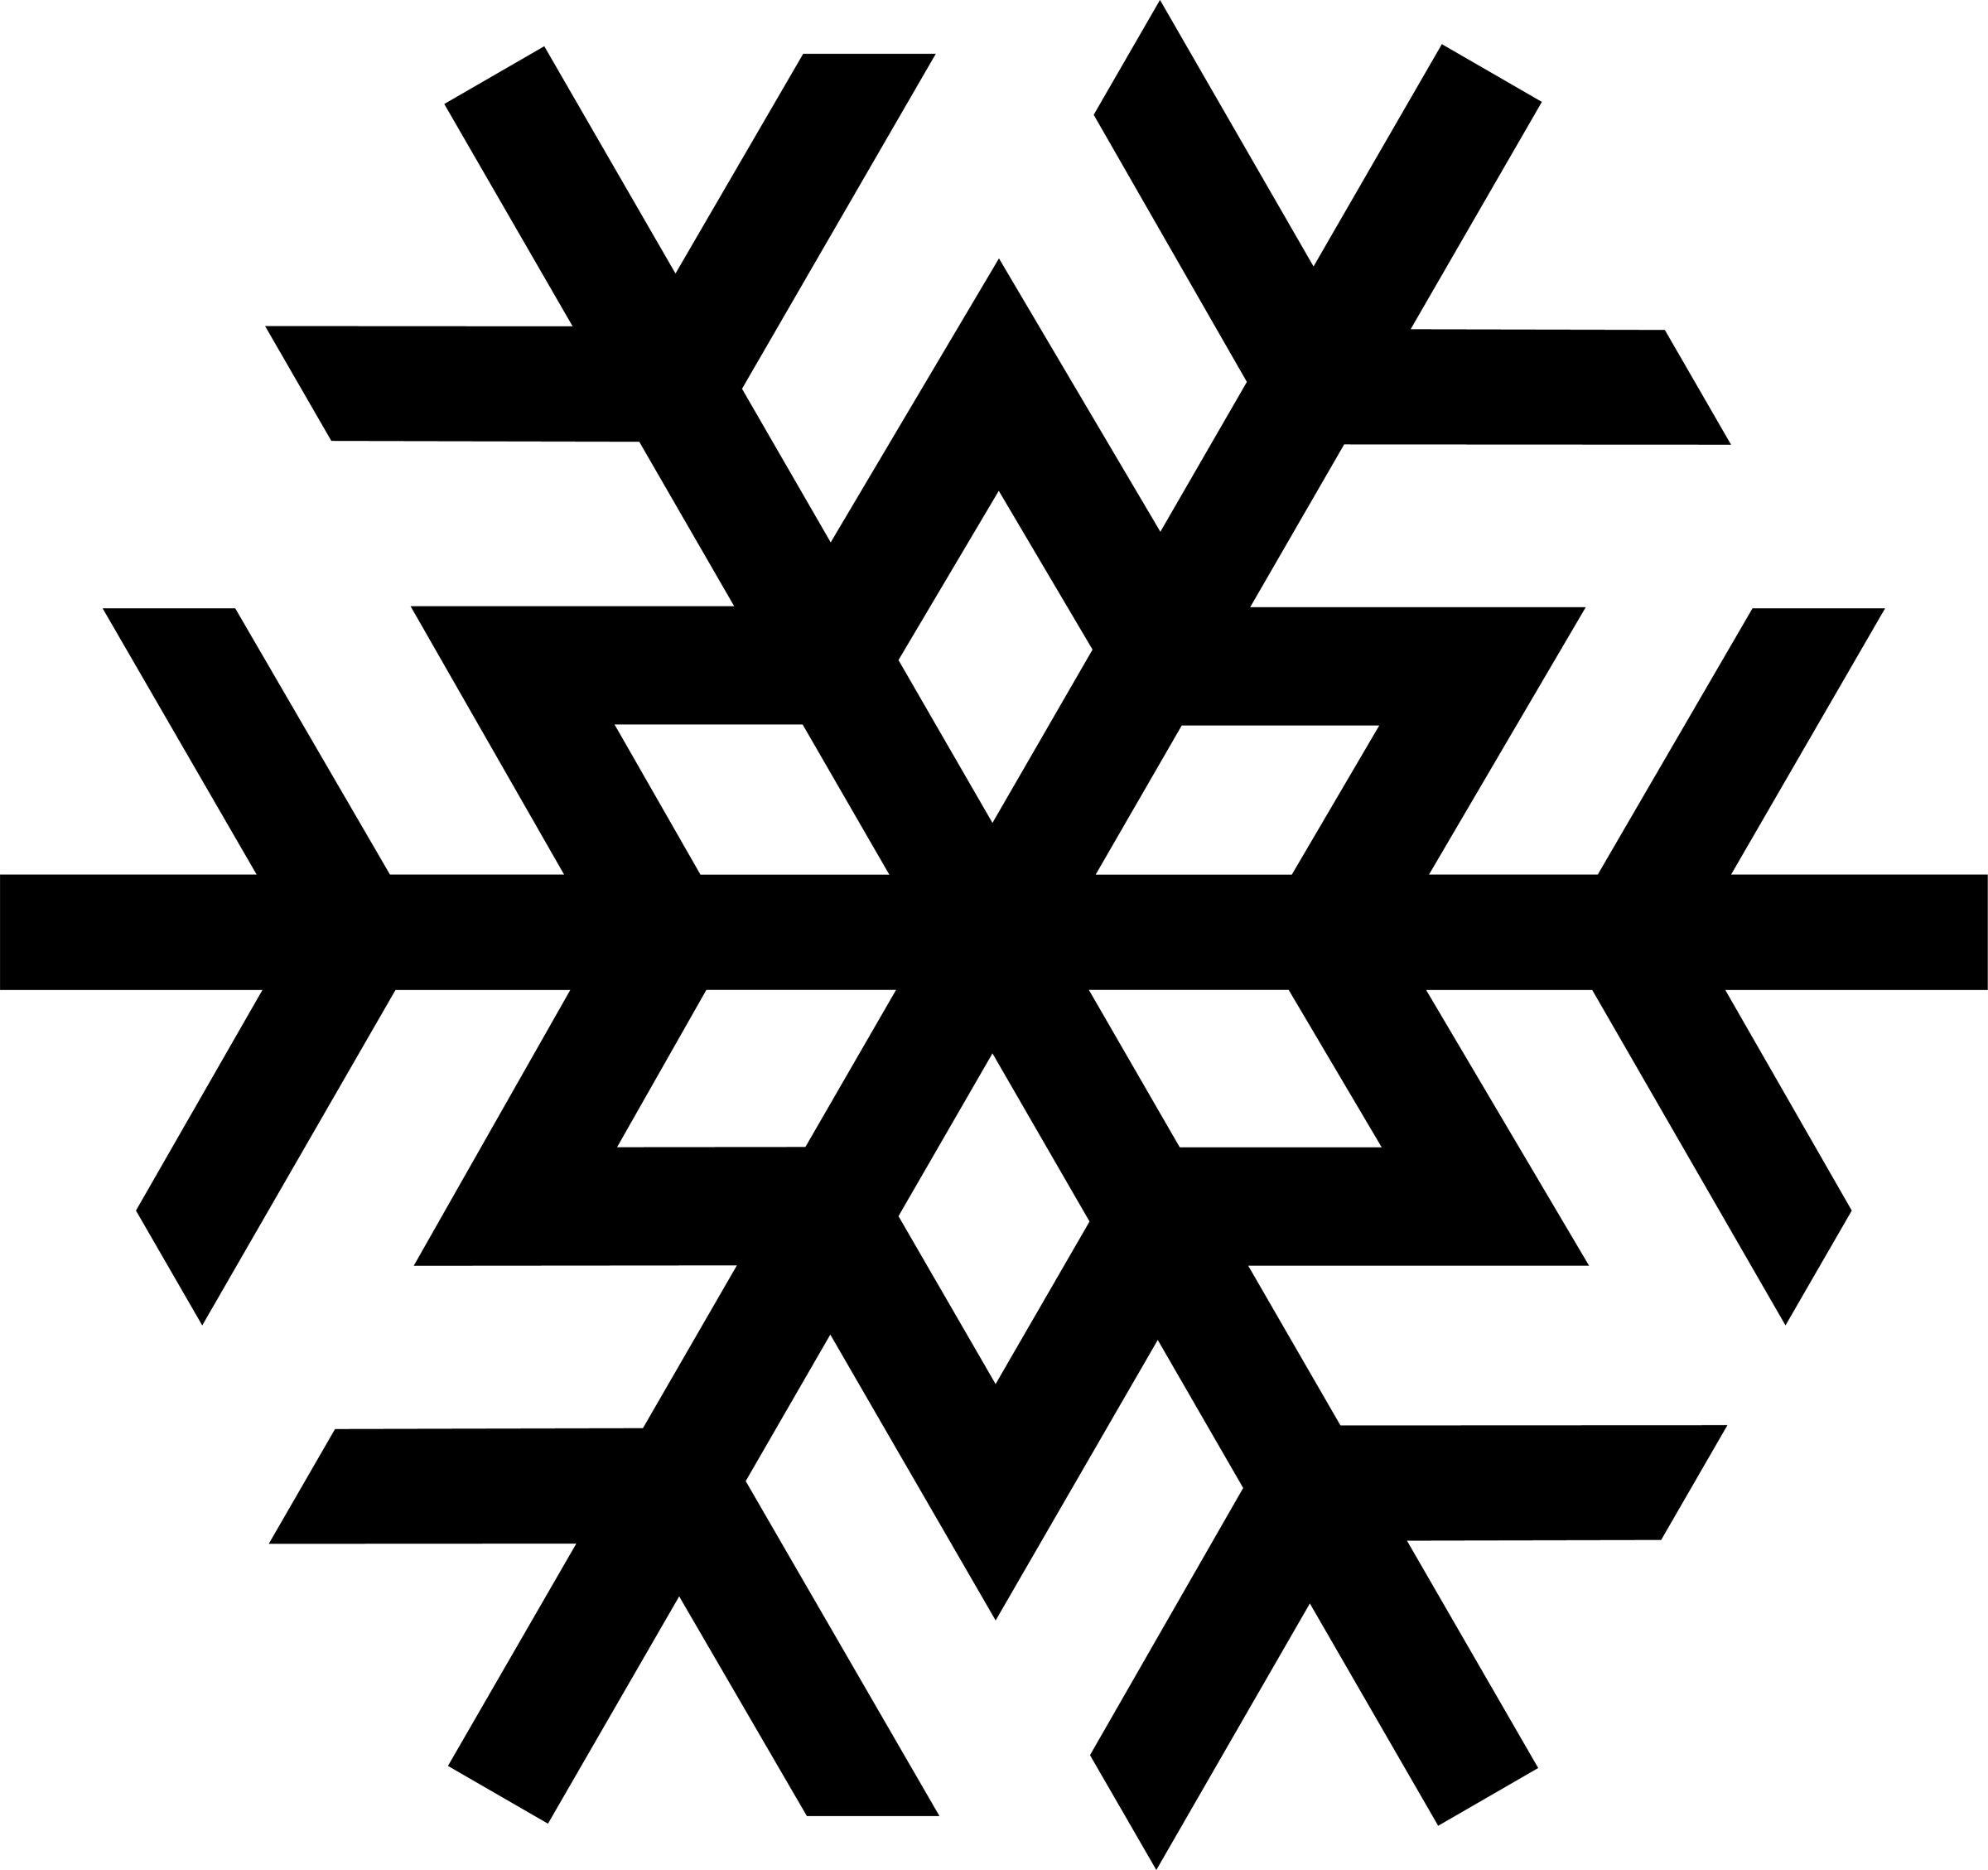 jpg transparent Flake clipart simple snowflake. Free clip art images